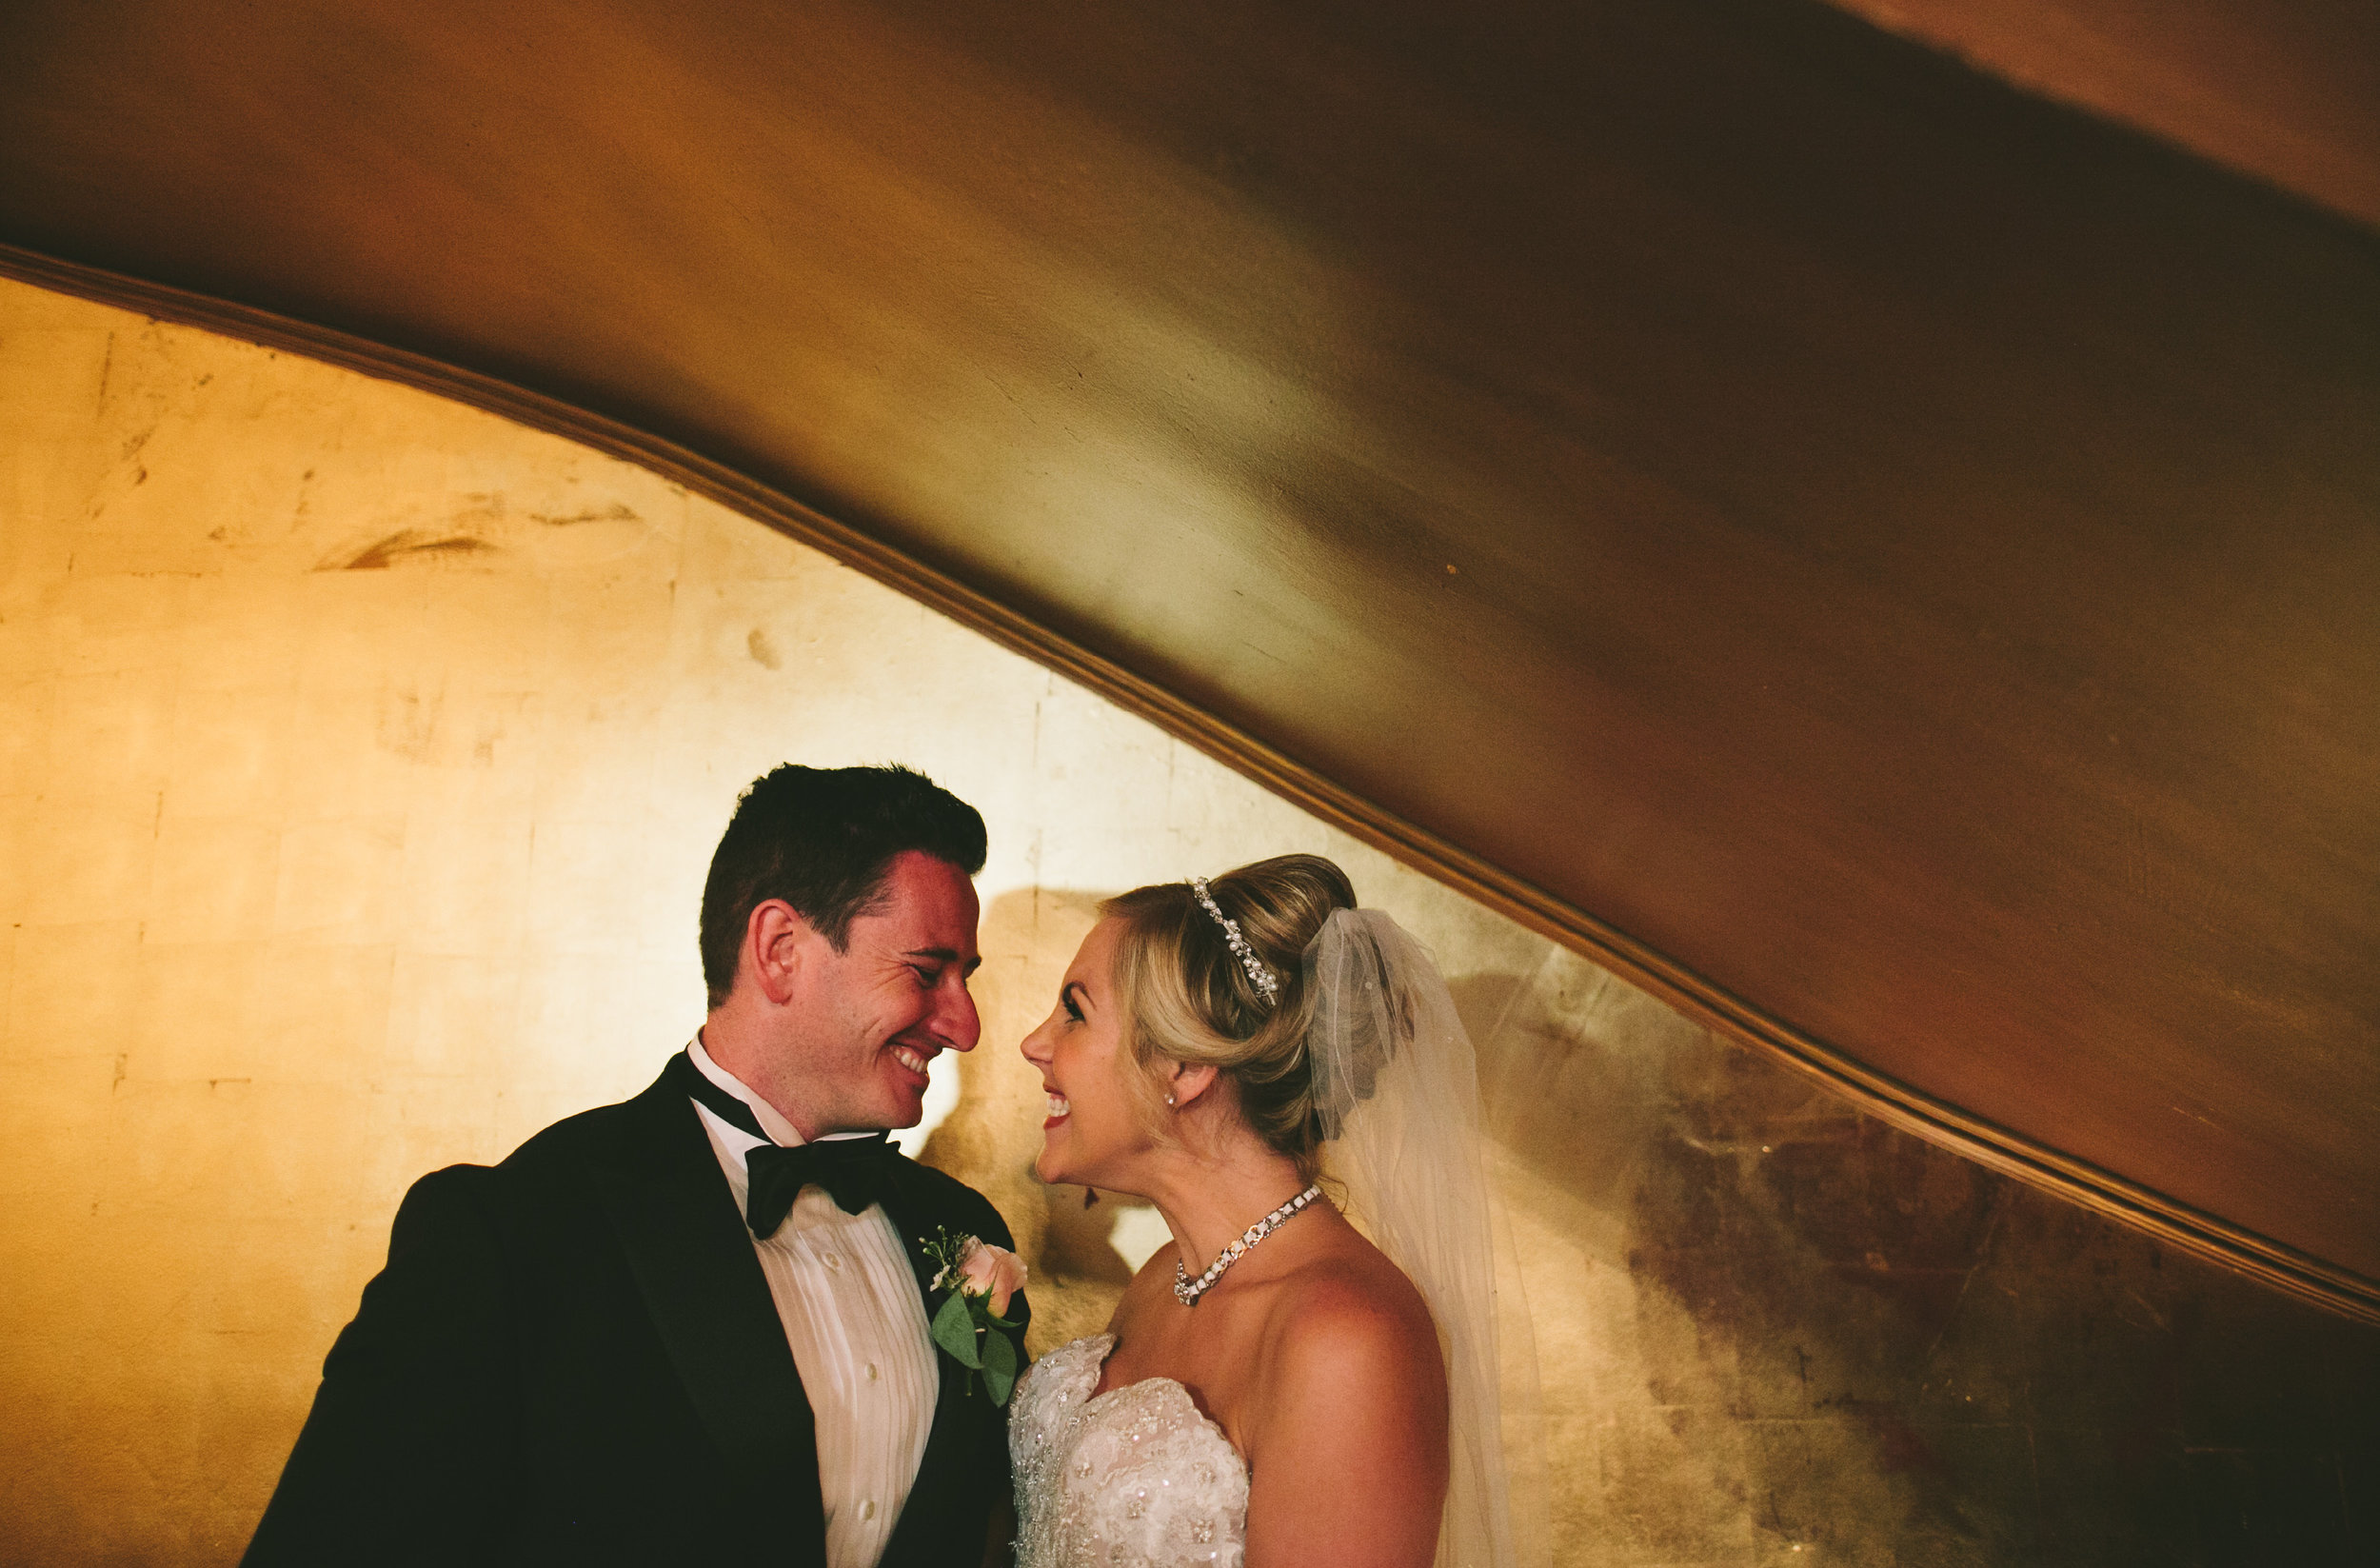 Katie + Dan Wedding at the Cruz Building Miami55.jpg